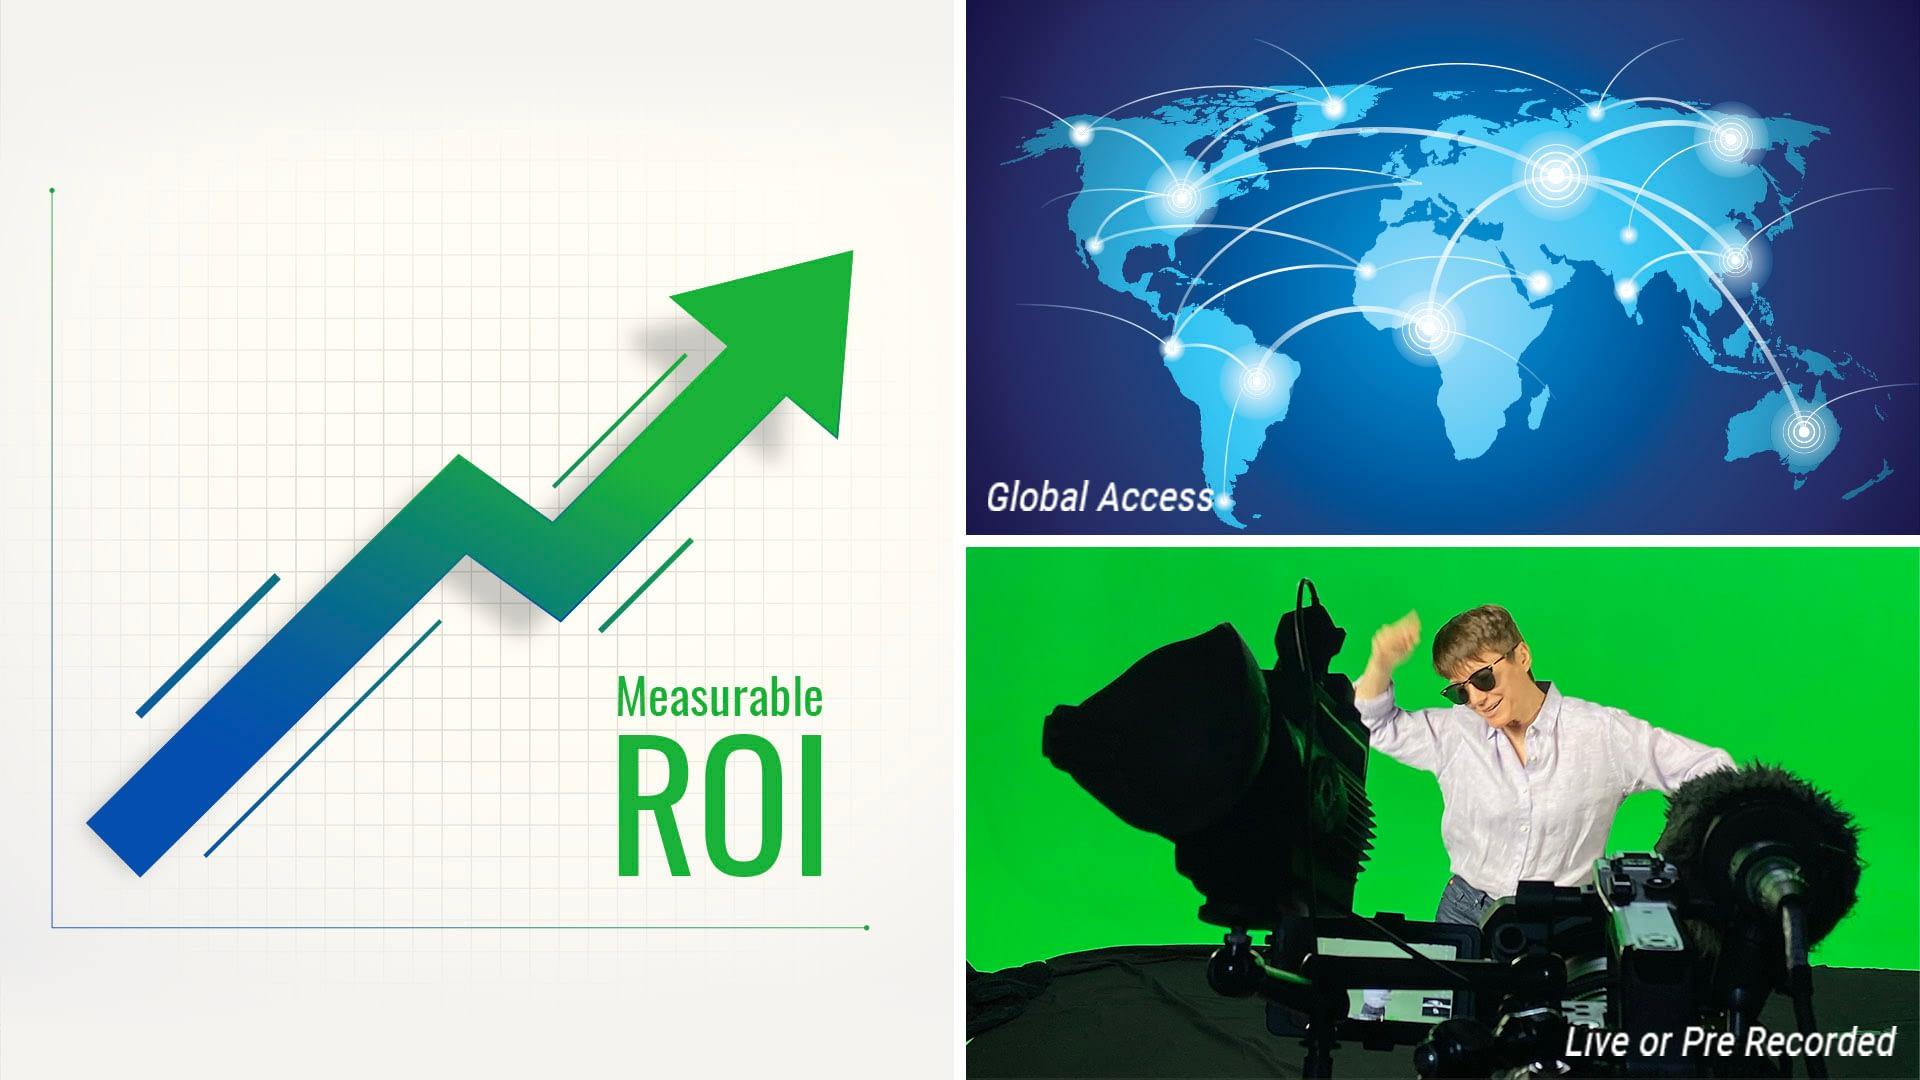 Alive TV - Measurable ROI & Global Access